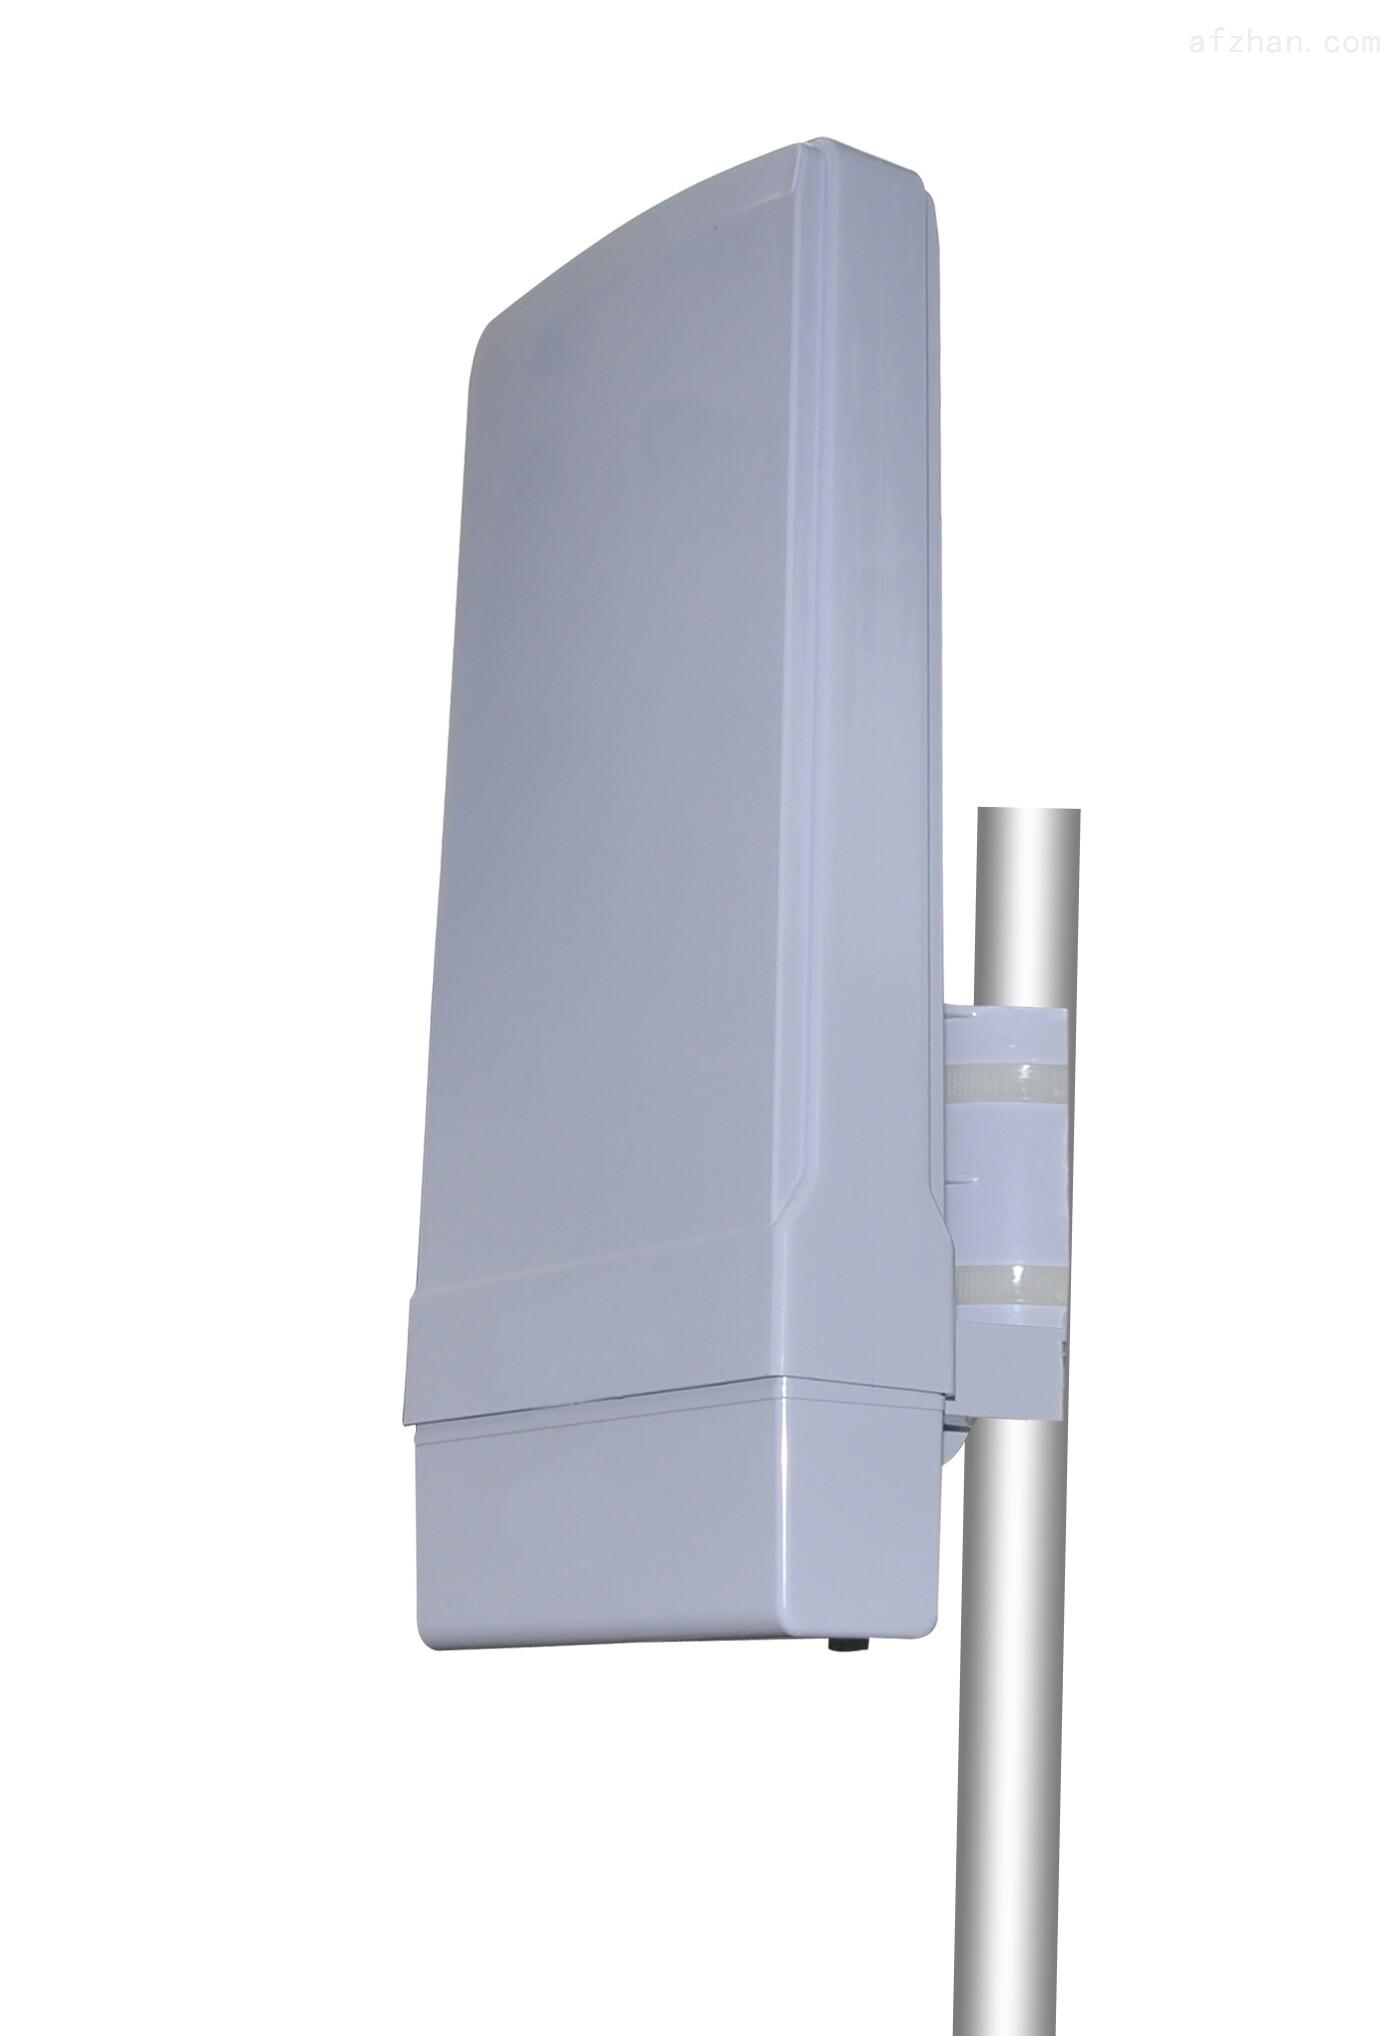 5.8G无线网桥,3公里无线监控